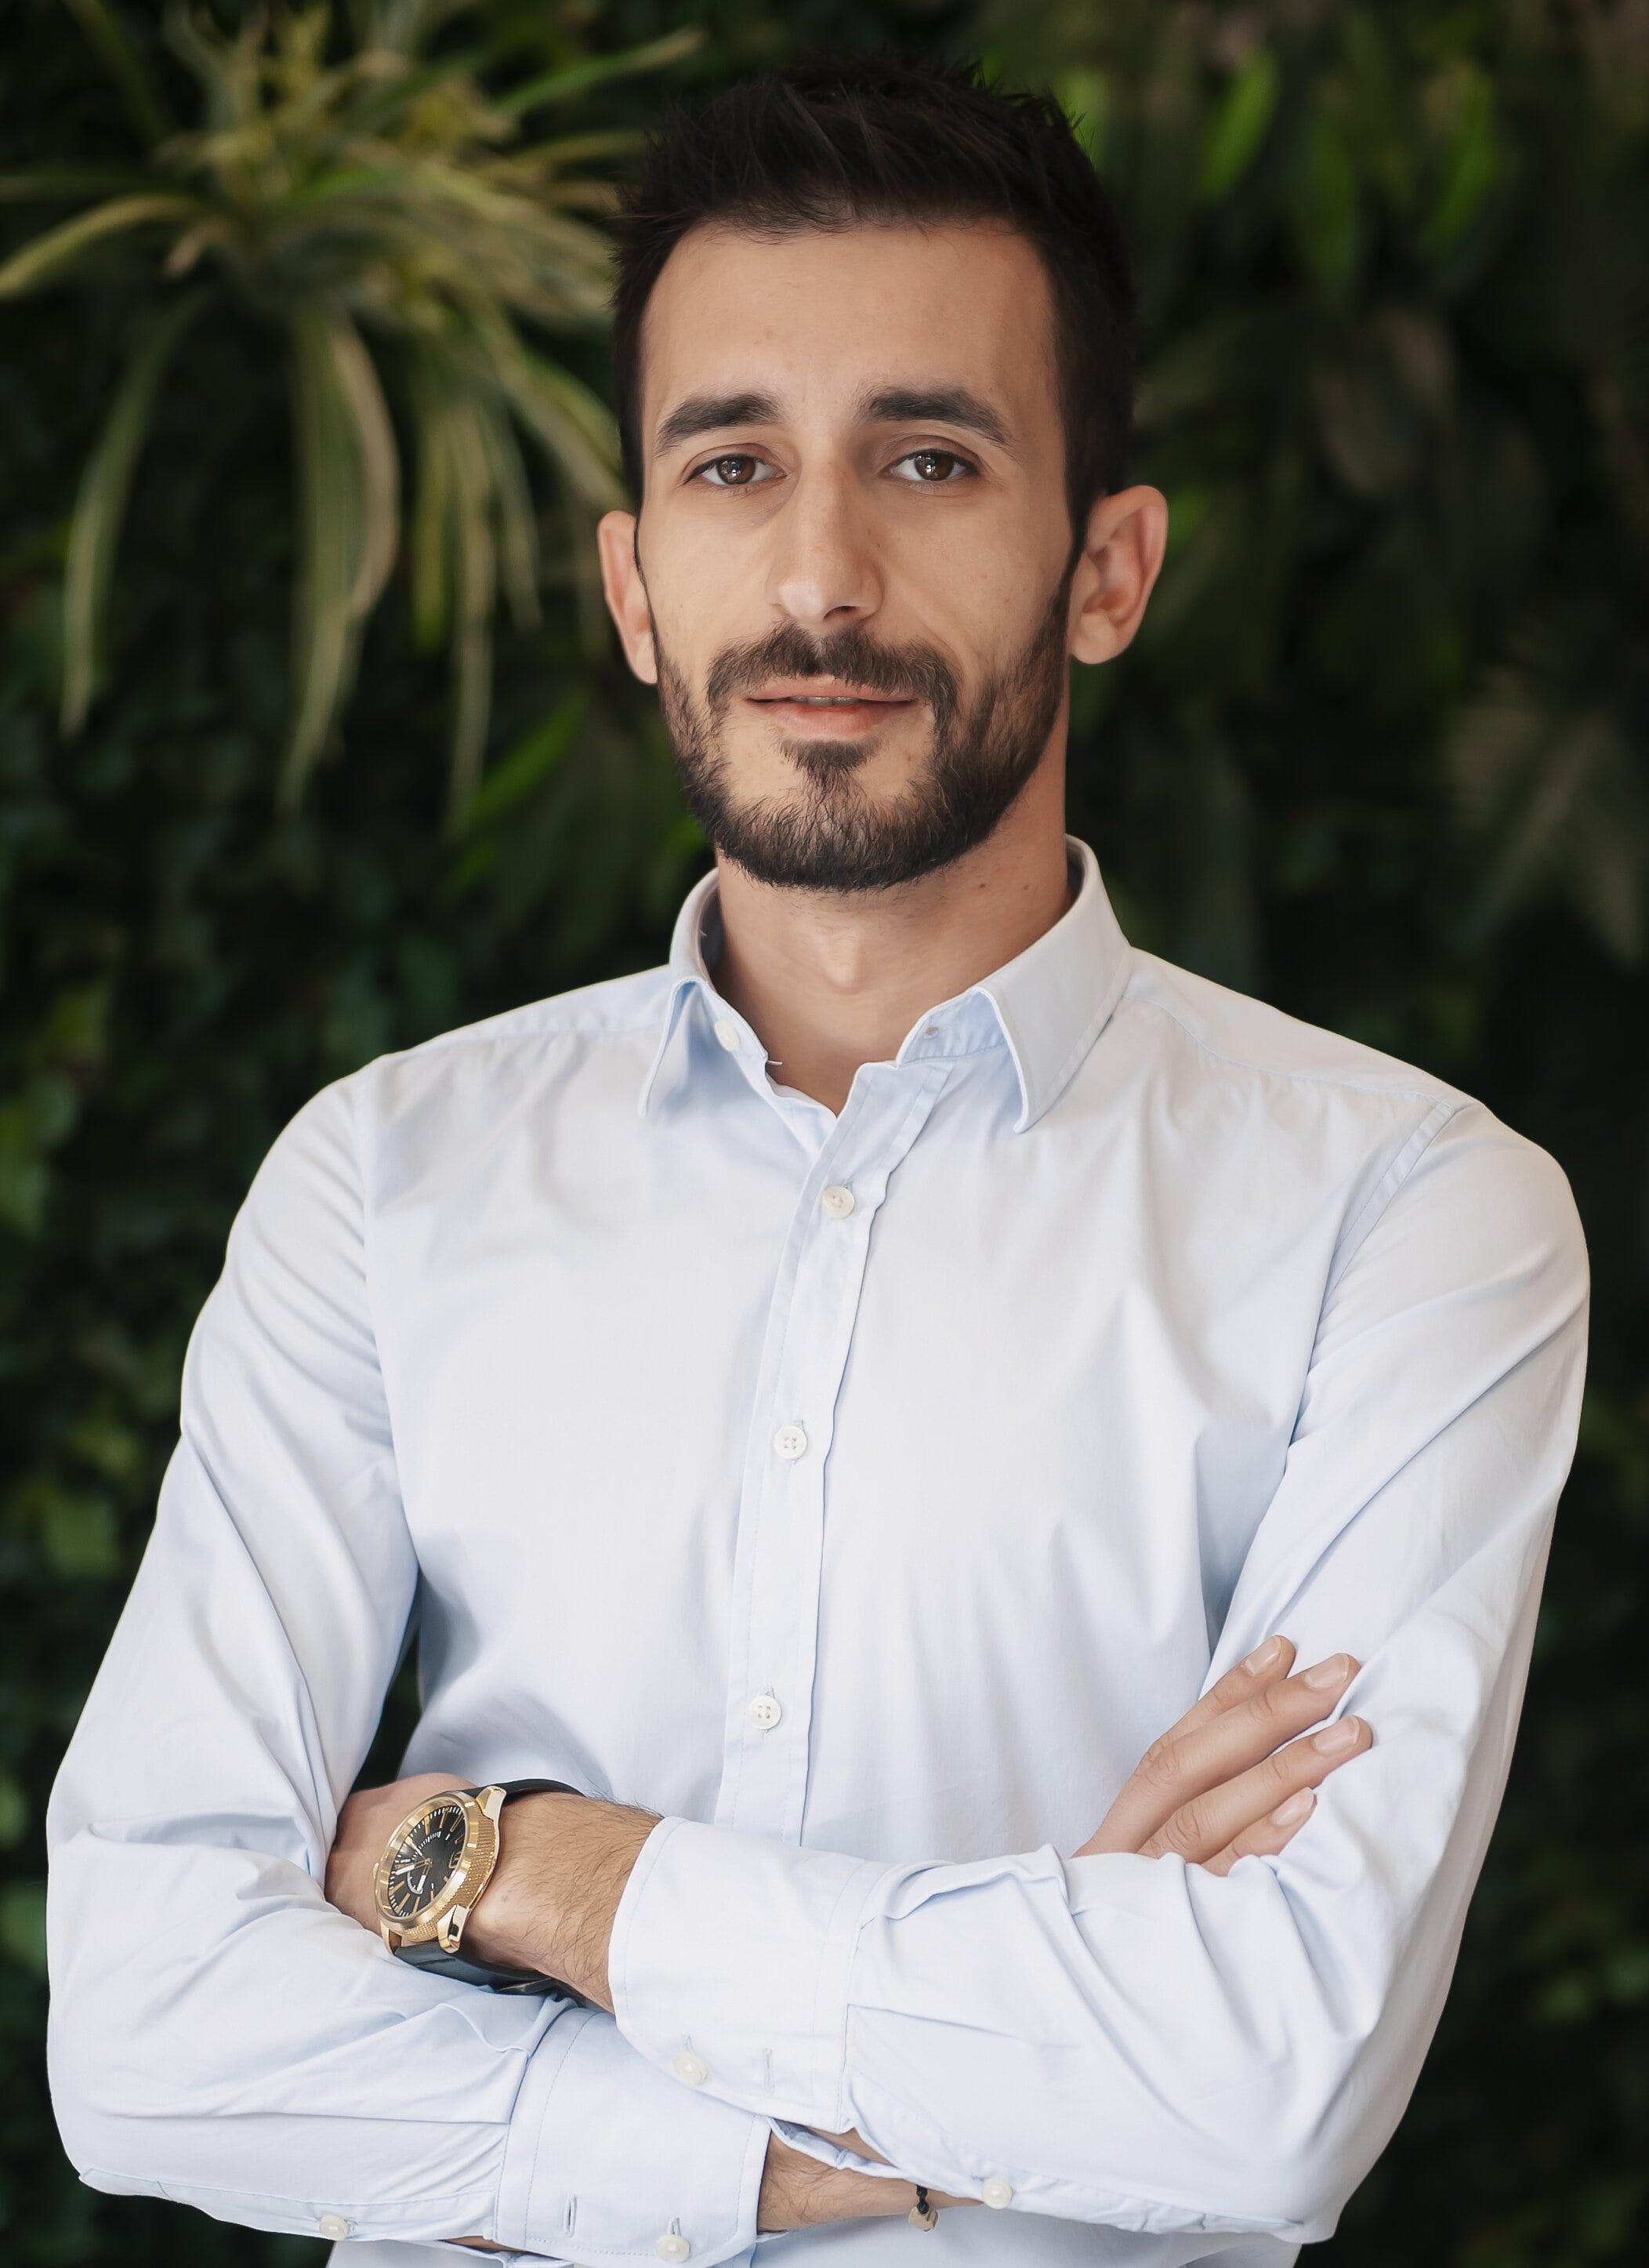 Ermir Myrtaj